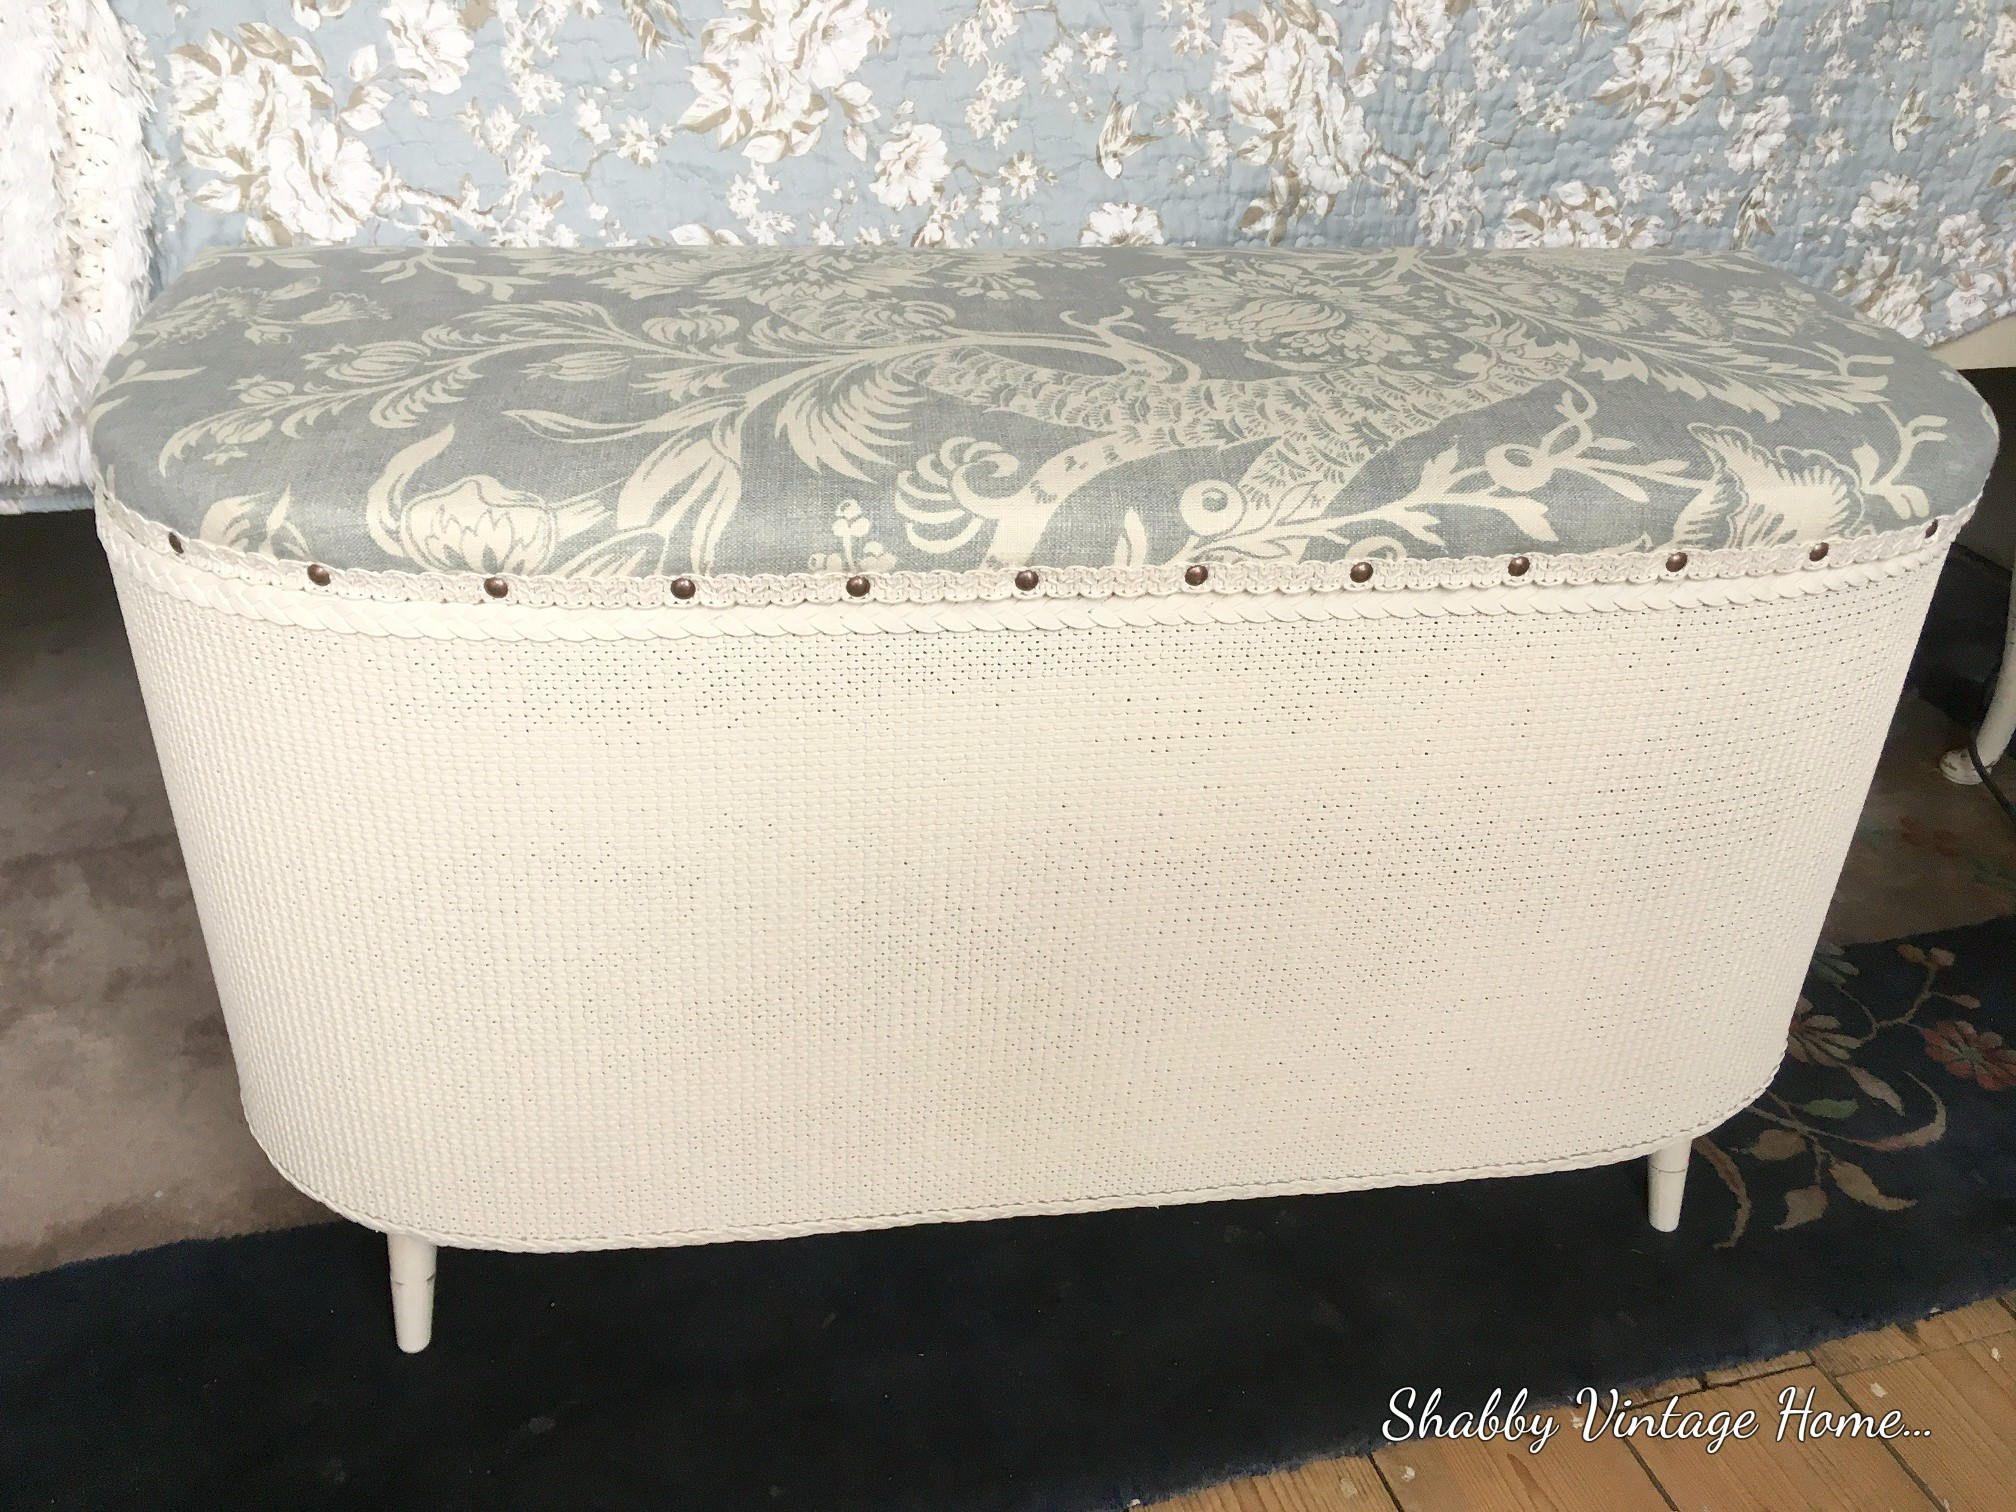 Incredible Vintage Loom Blanket Box Retro Storage Ottoman Foot Stool Inzonedesignstudio Interior Chair Design Inzonedesignstudiocom